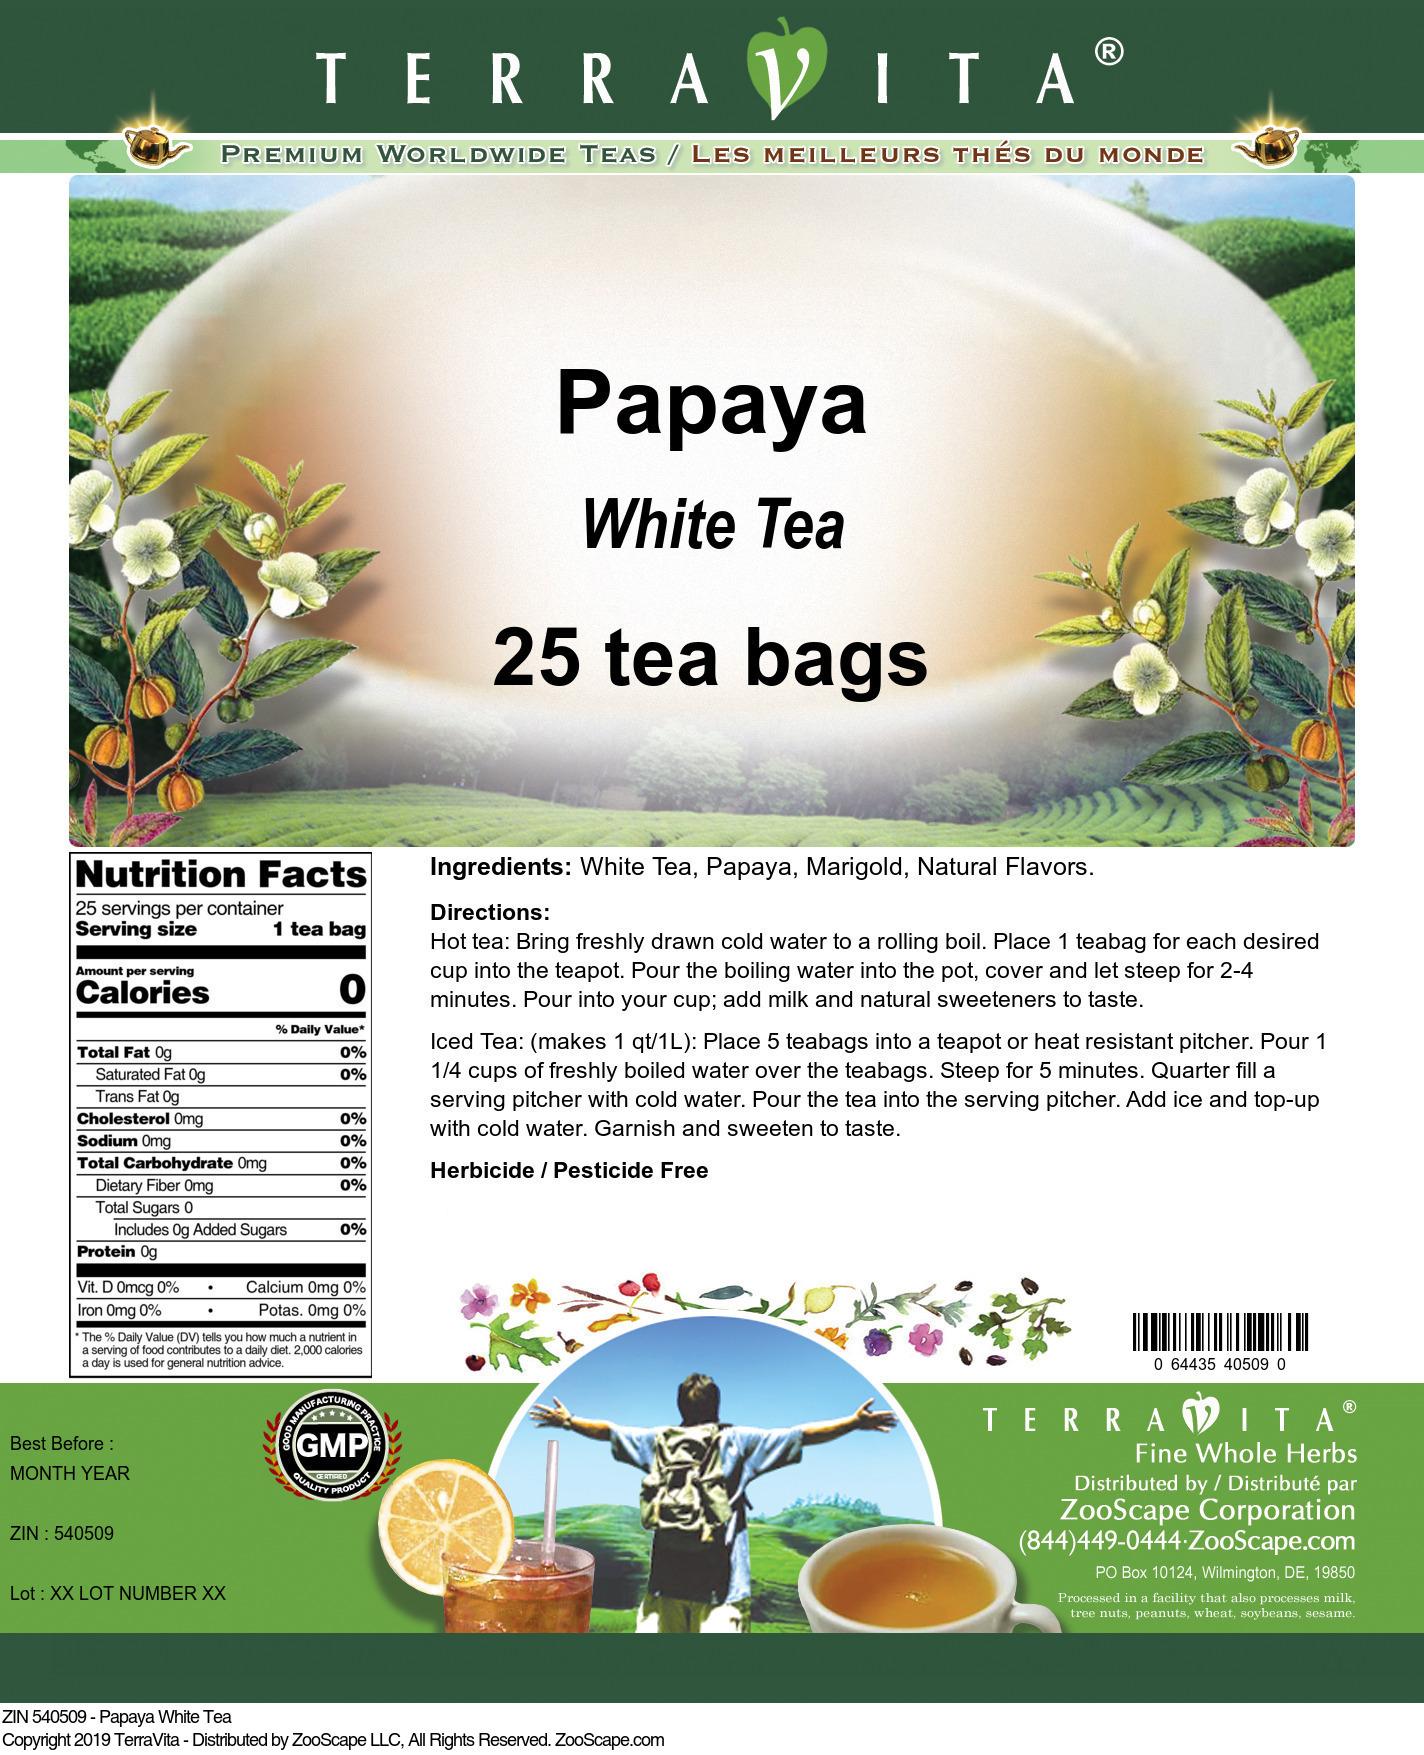 Papaya White Tea